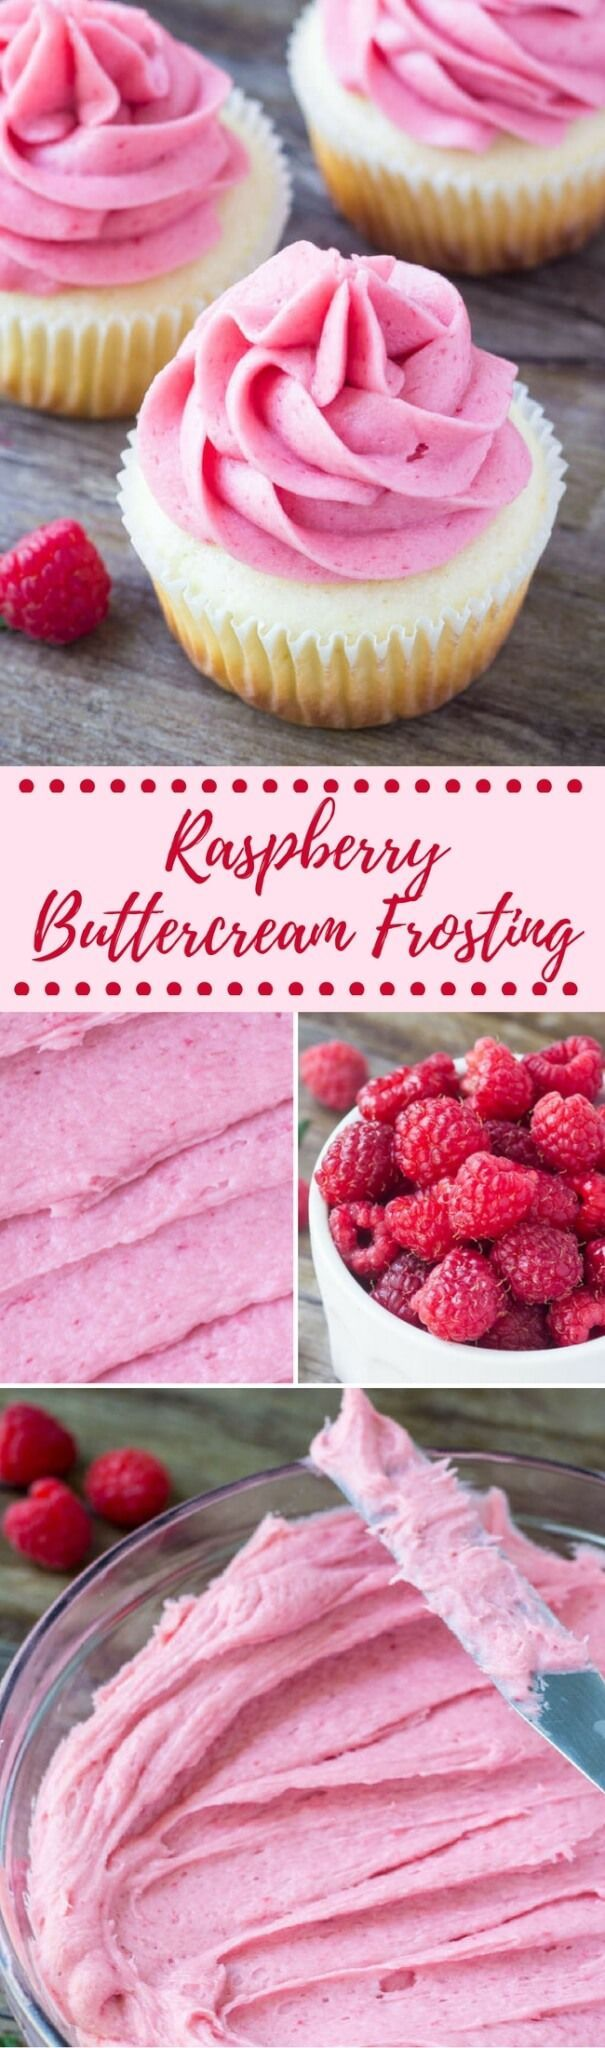 Raspberry Buttercream Frosting - Fresh or Frozen Berries